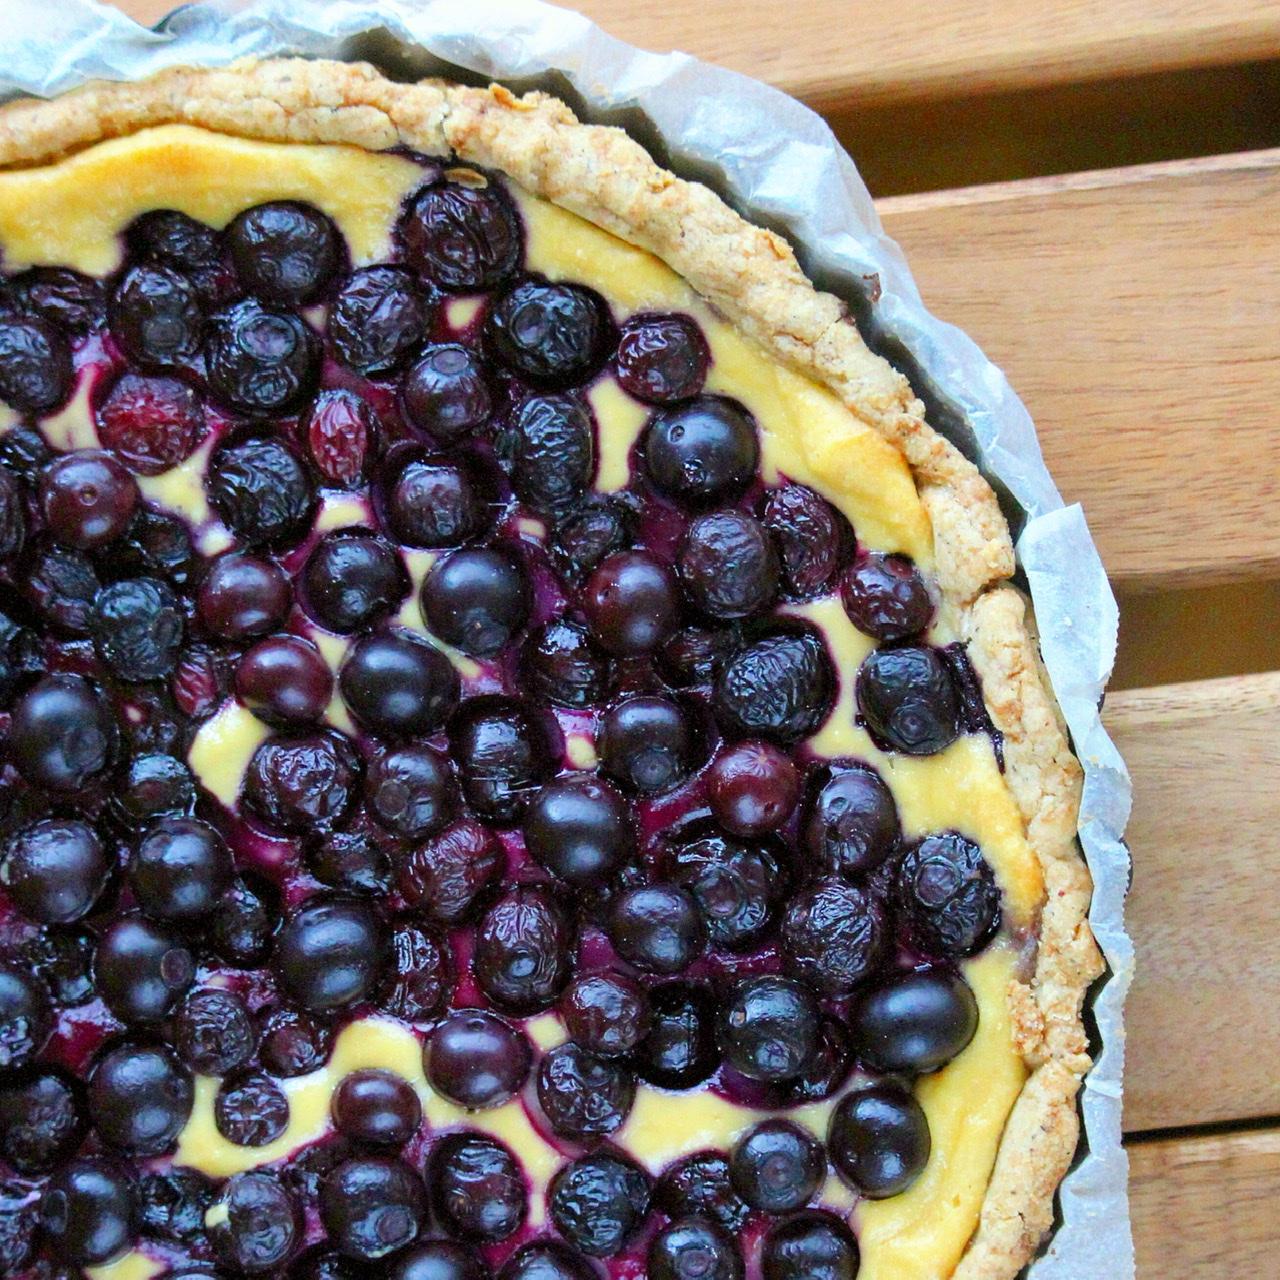 Gluten-Free Blueberry and Sweet Ricotta Crostata